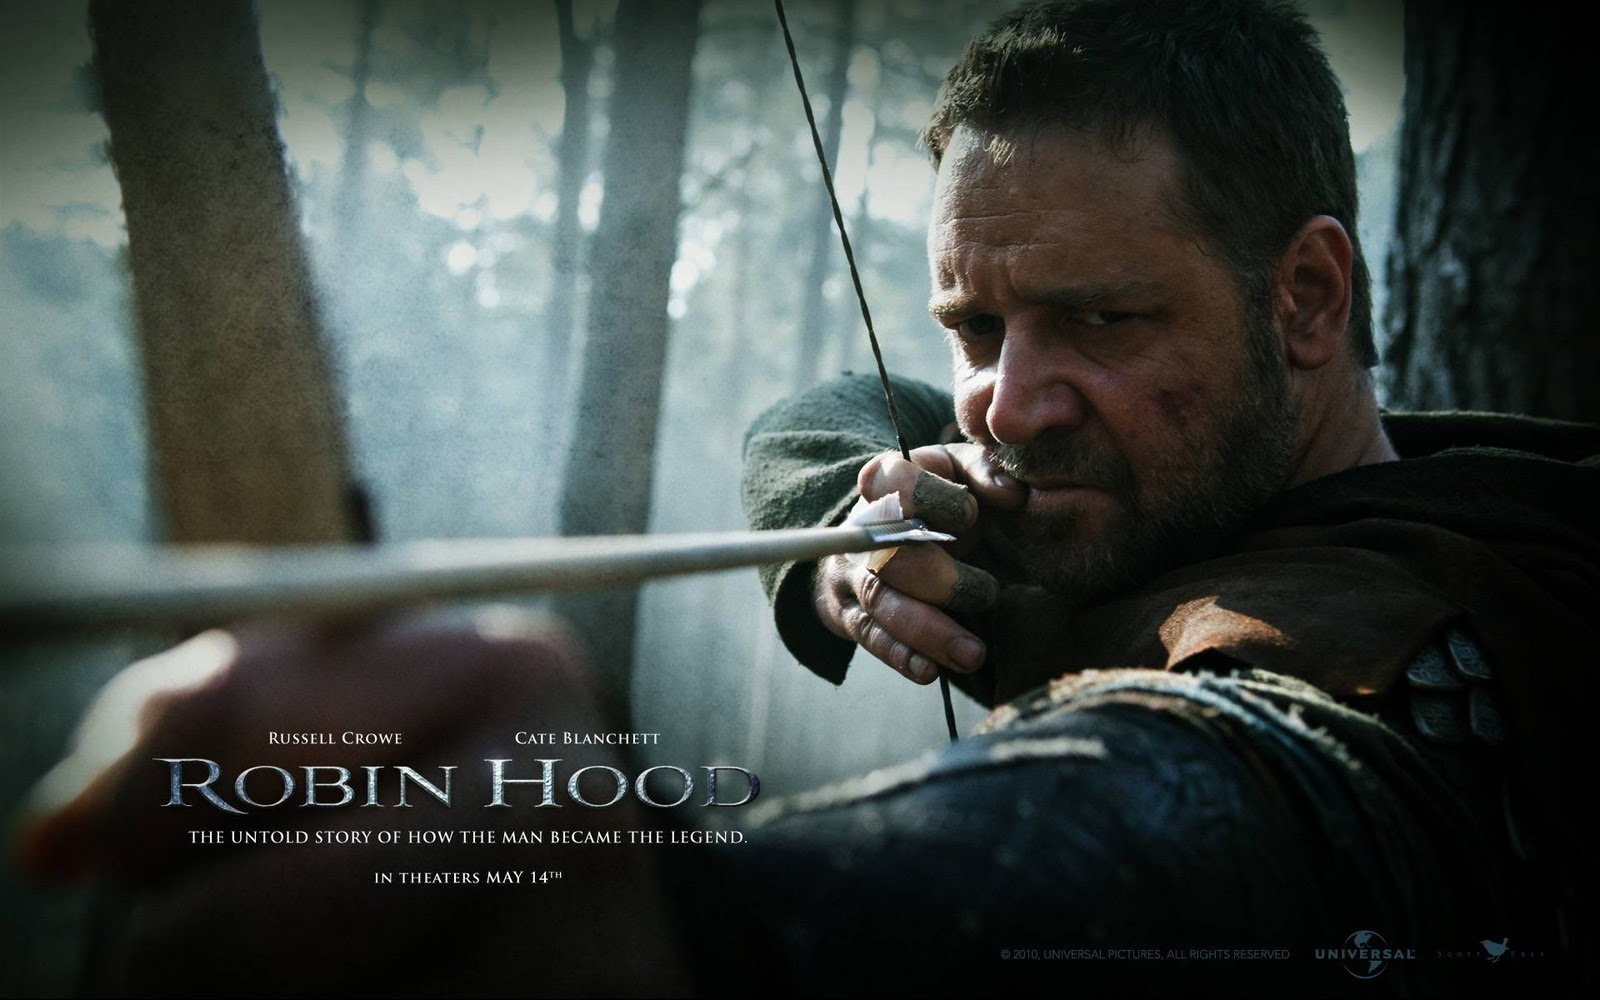 http://1.bp.blogspot.com/-VO-LAhxq85Y/Tq7Me0GIqaI/AAAAAAAAAK0/J6n1lqSlClk/s1600/Robin+Hood+Russell+Crowe.jpg